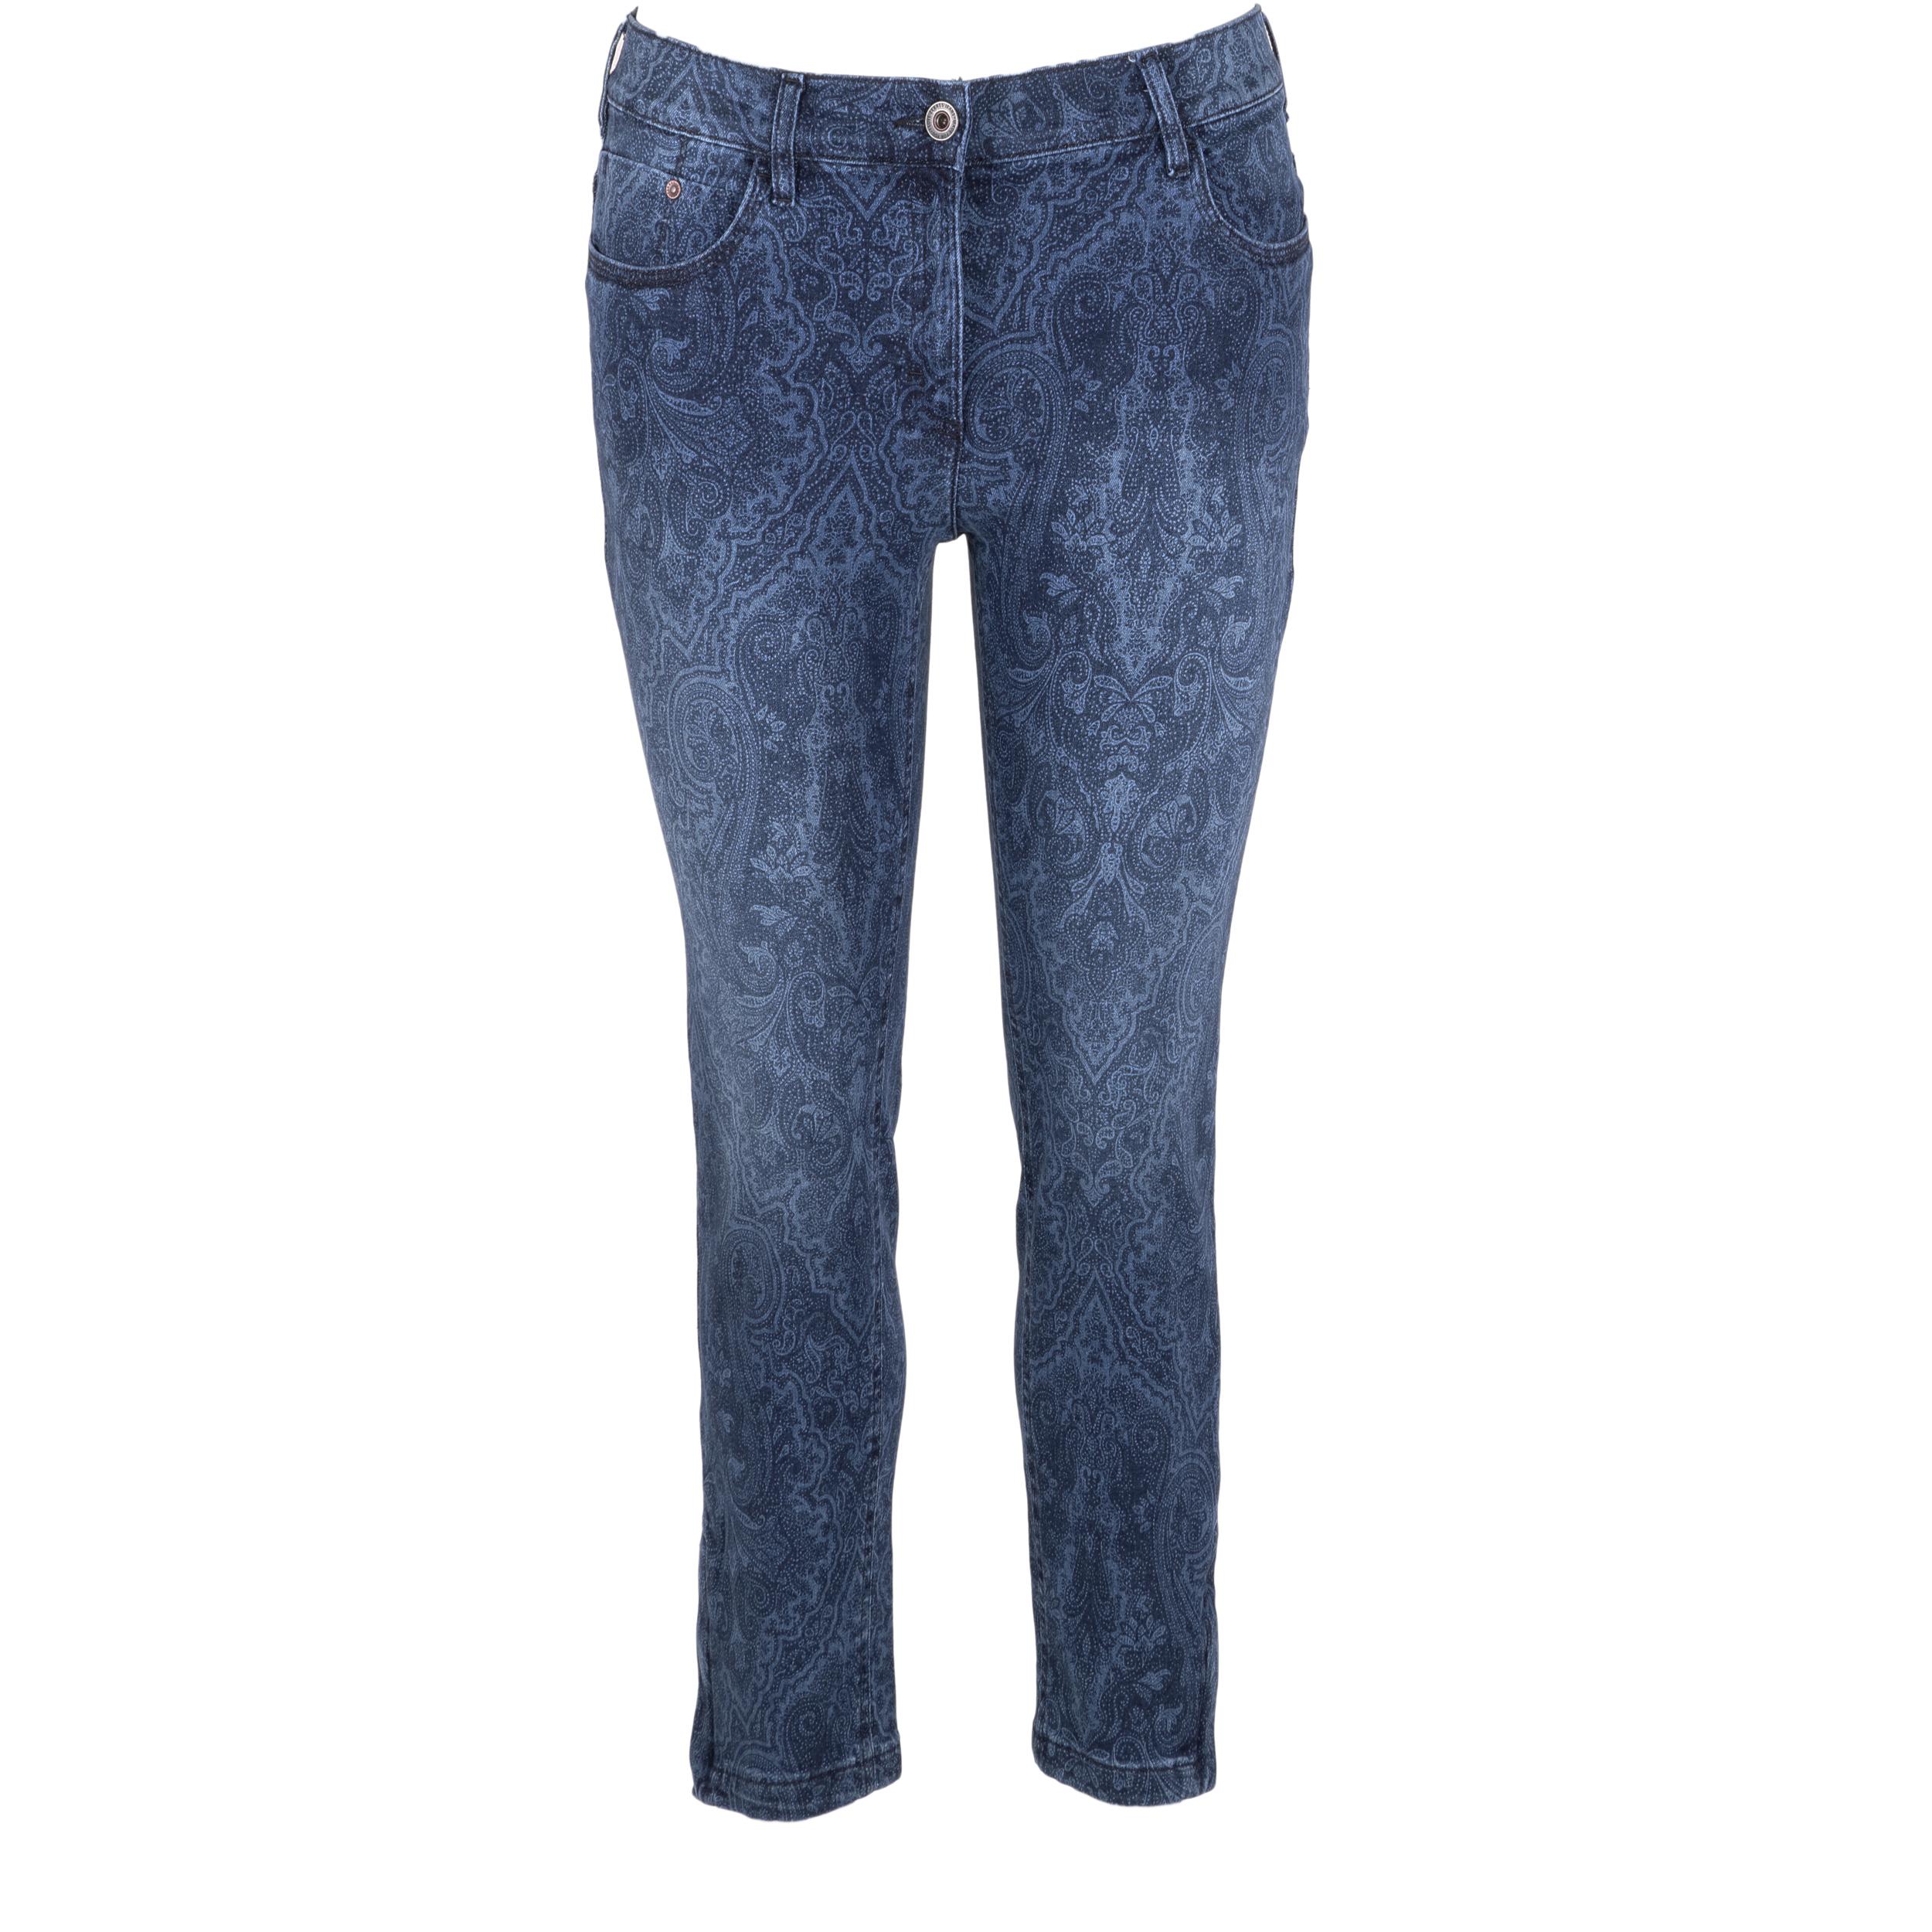 Zerres Damen Jeans Carla gemustert 7/8 Länge - blau 46